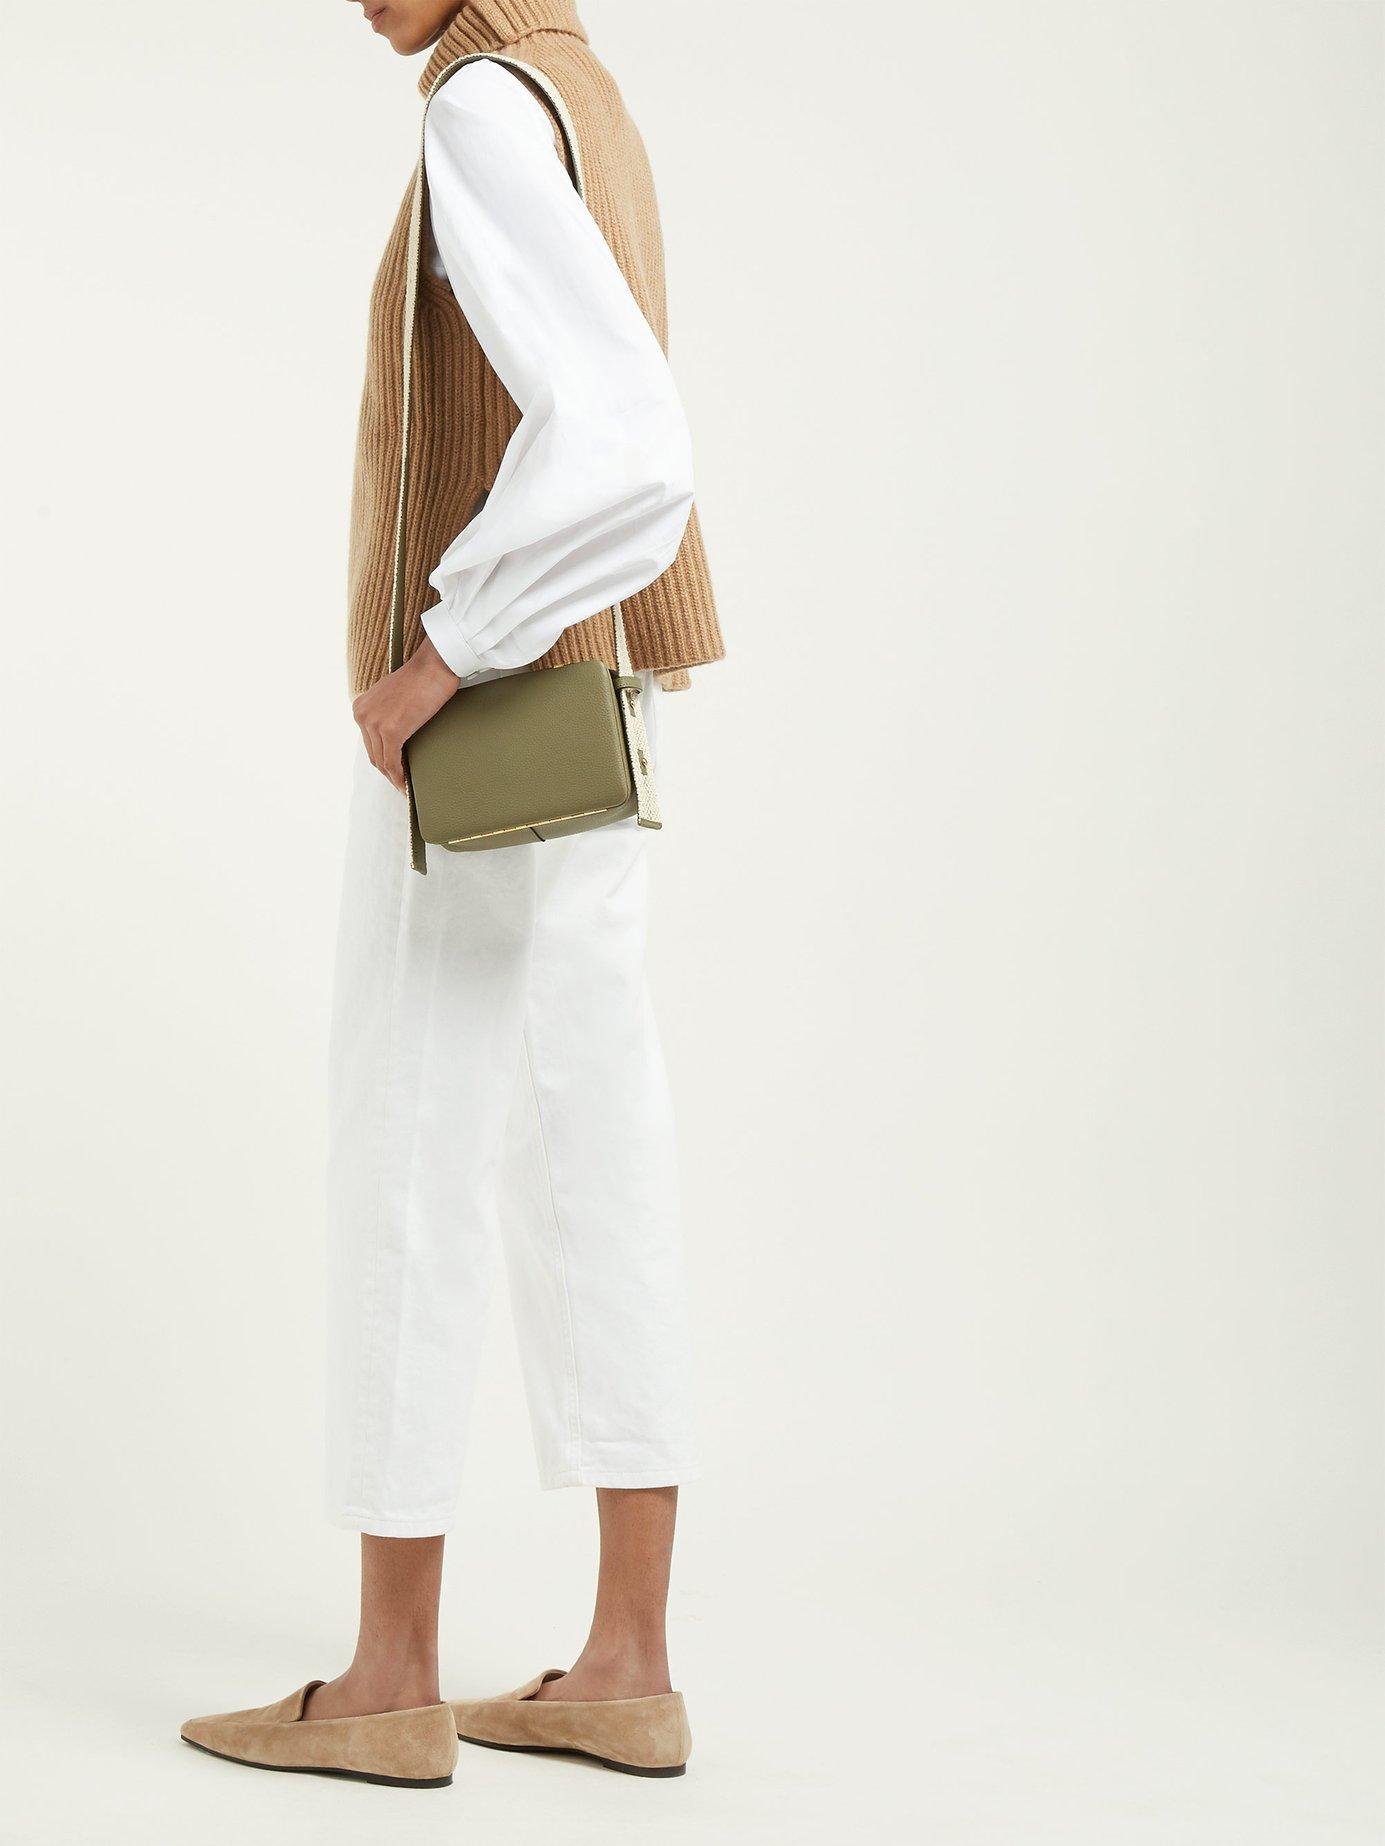 c354ec3259e3 Lyst - Lutz Morris Maya Grained Leather Cross Body Bag in Natural